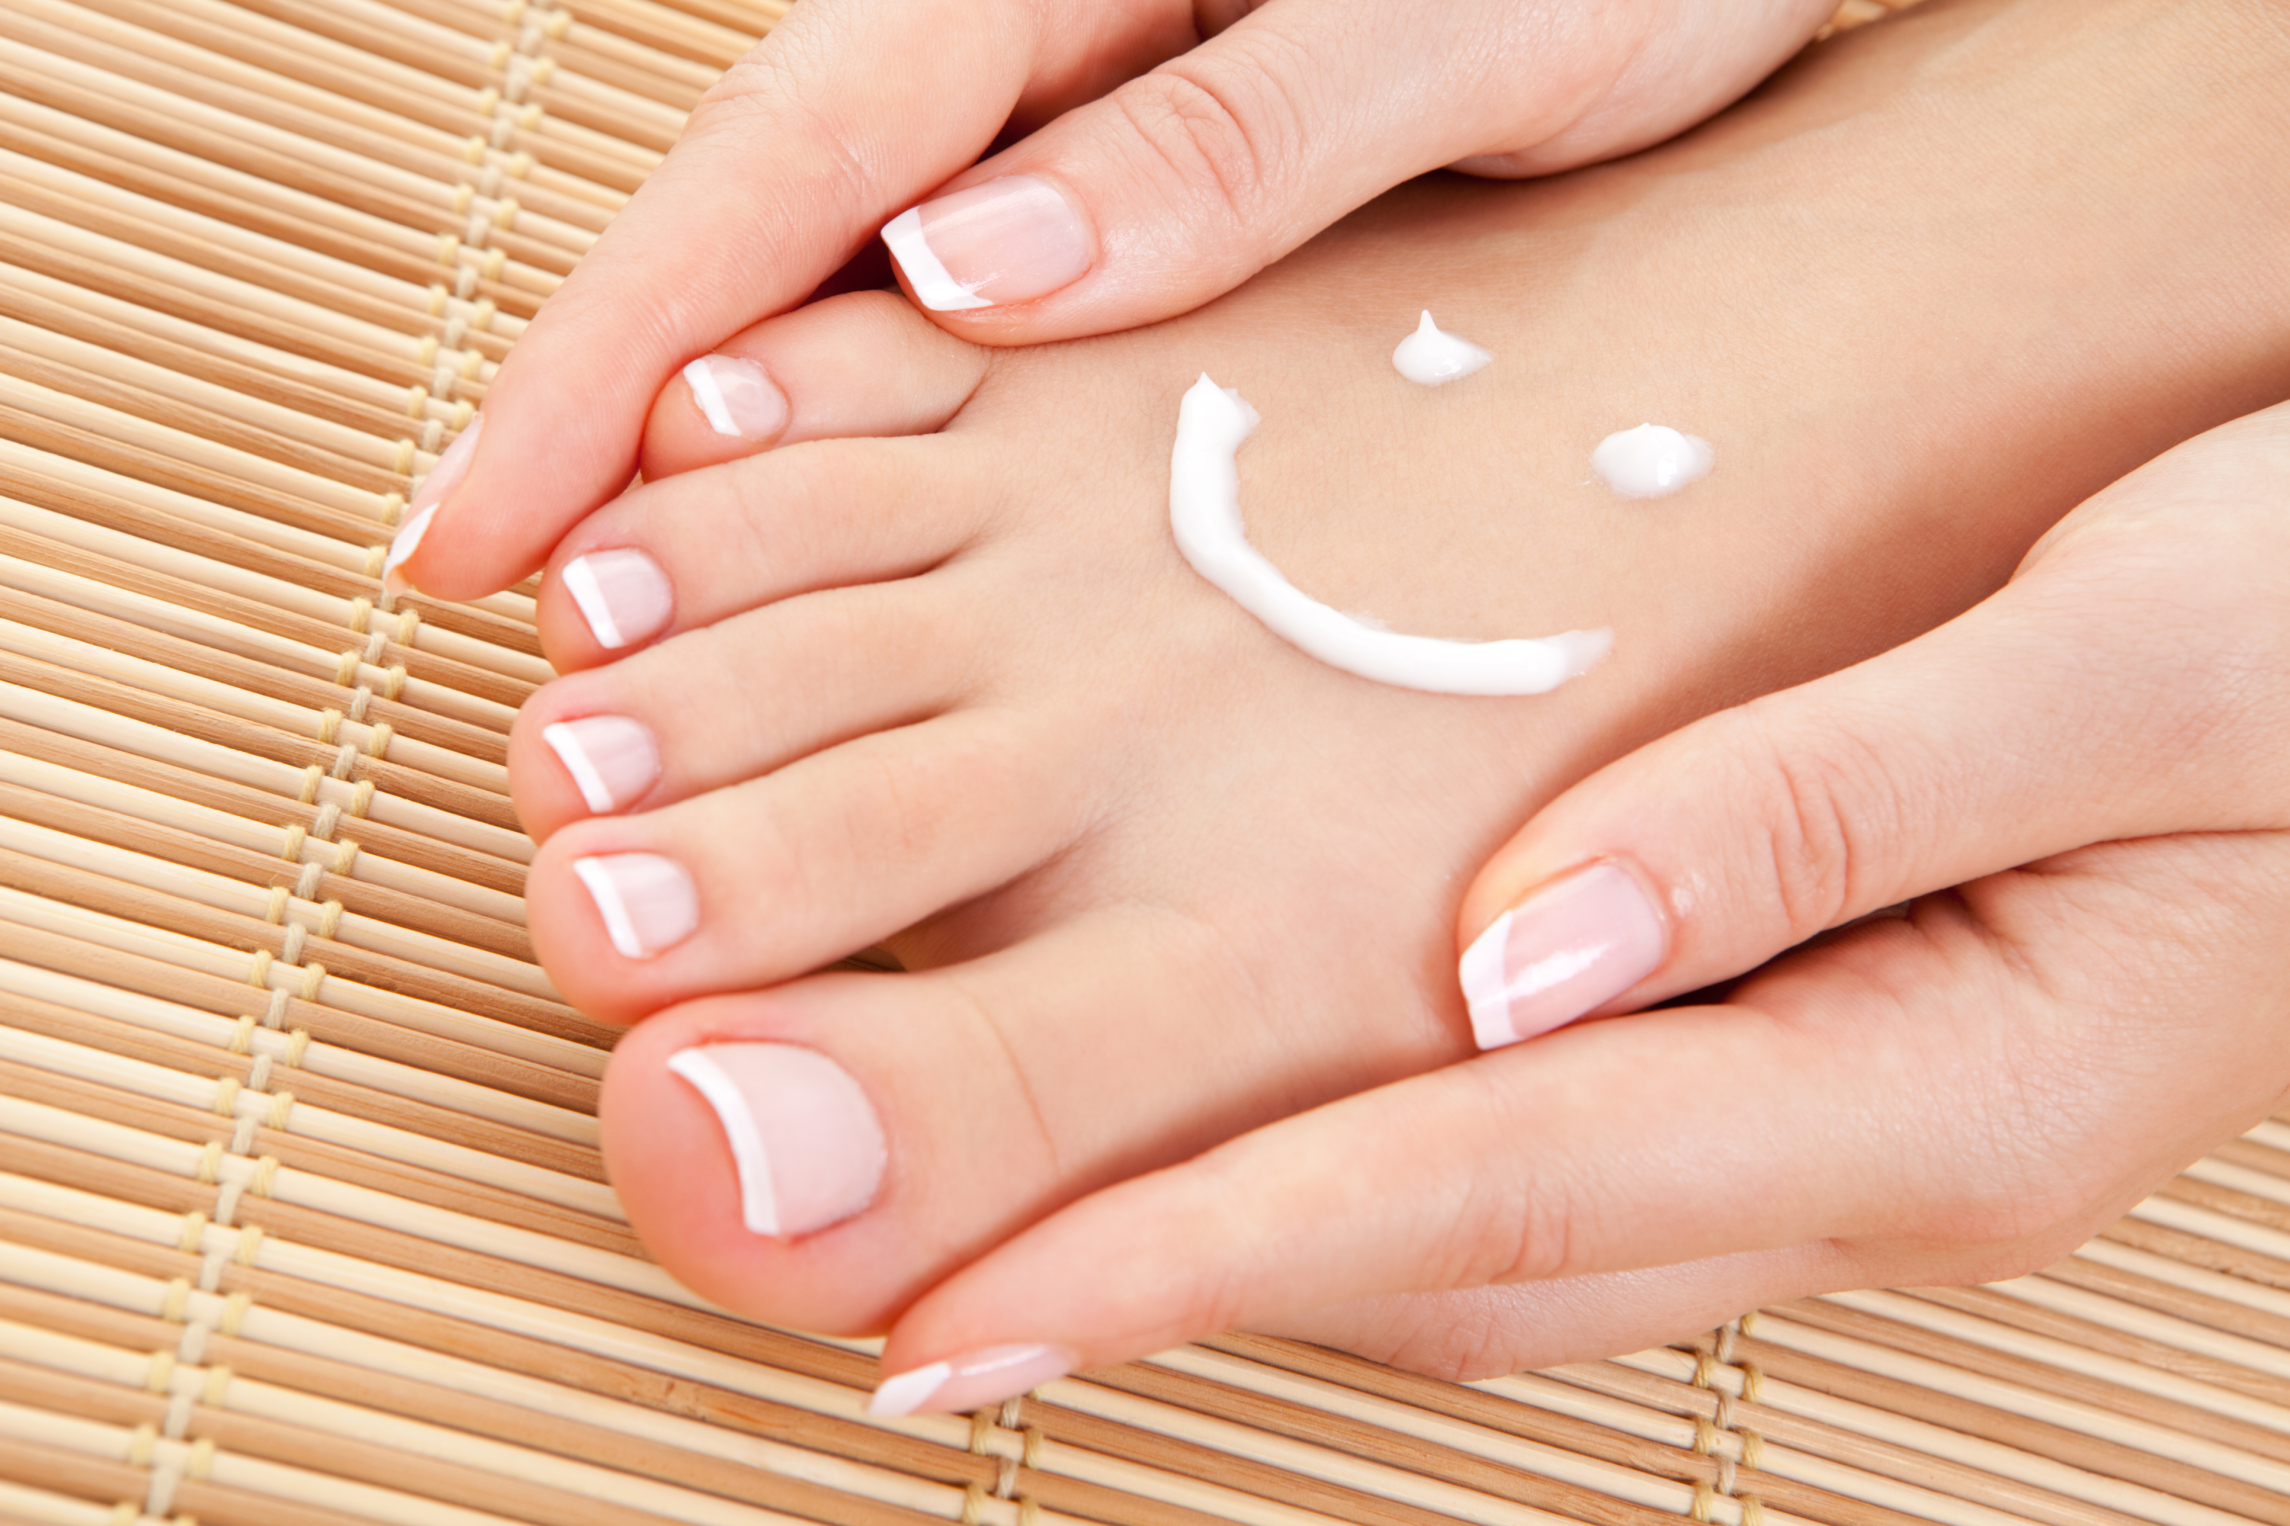 foot care regimen